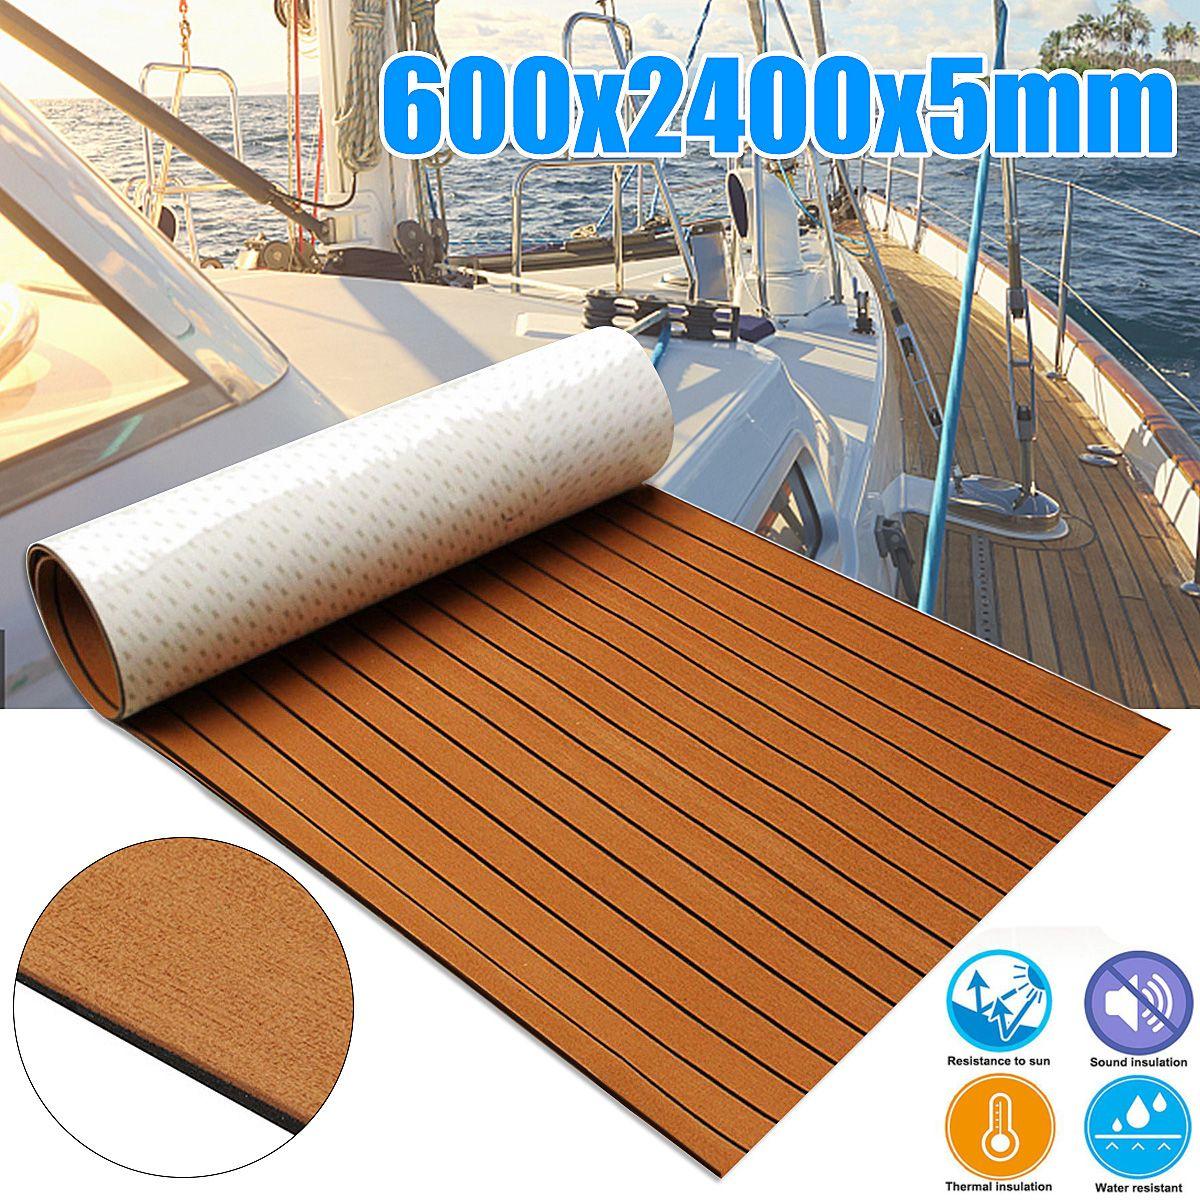 Self-Adhesive 600x2400x5mm Foam Teak Decking EVA Foam Marine Flooring Faux Boat Decking Sheet Accessories Marine Brown Black